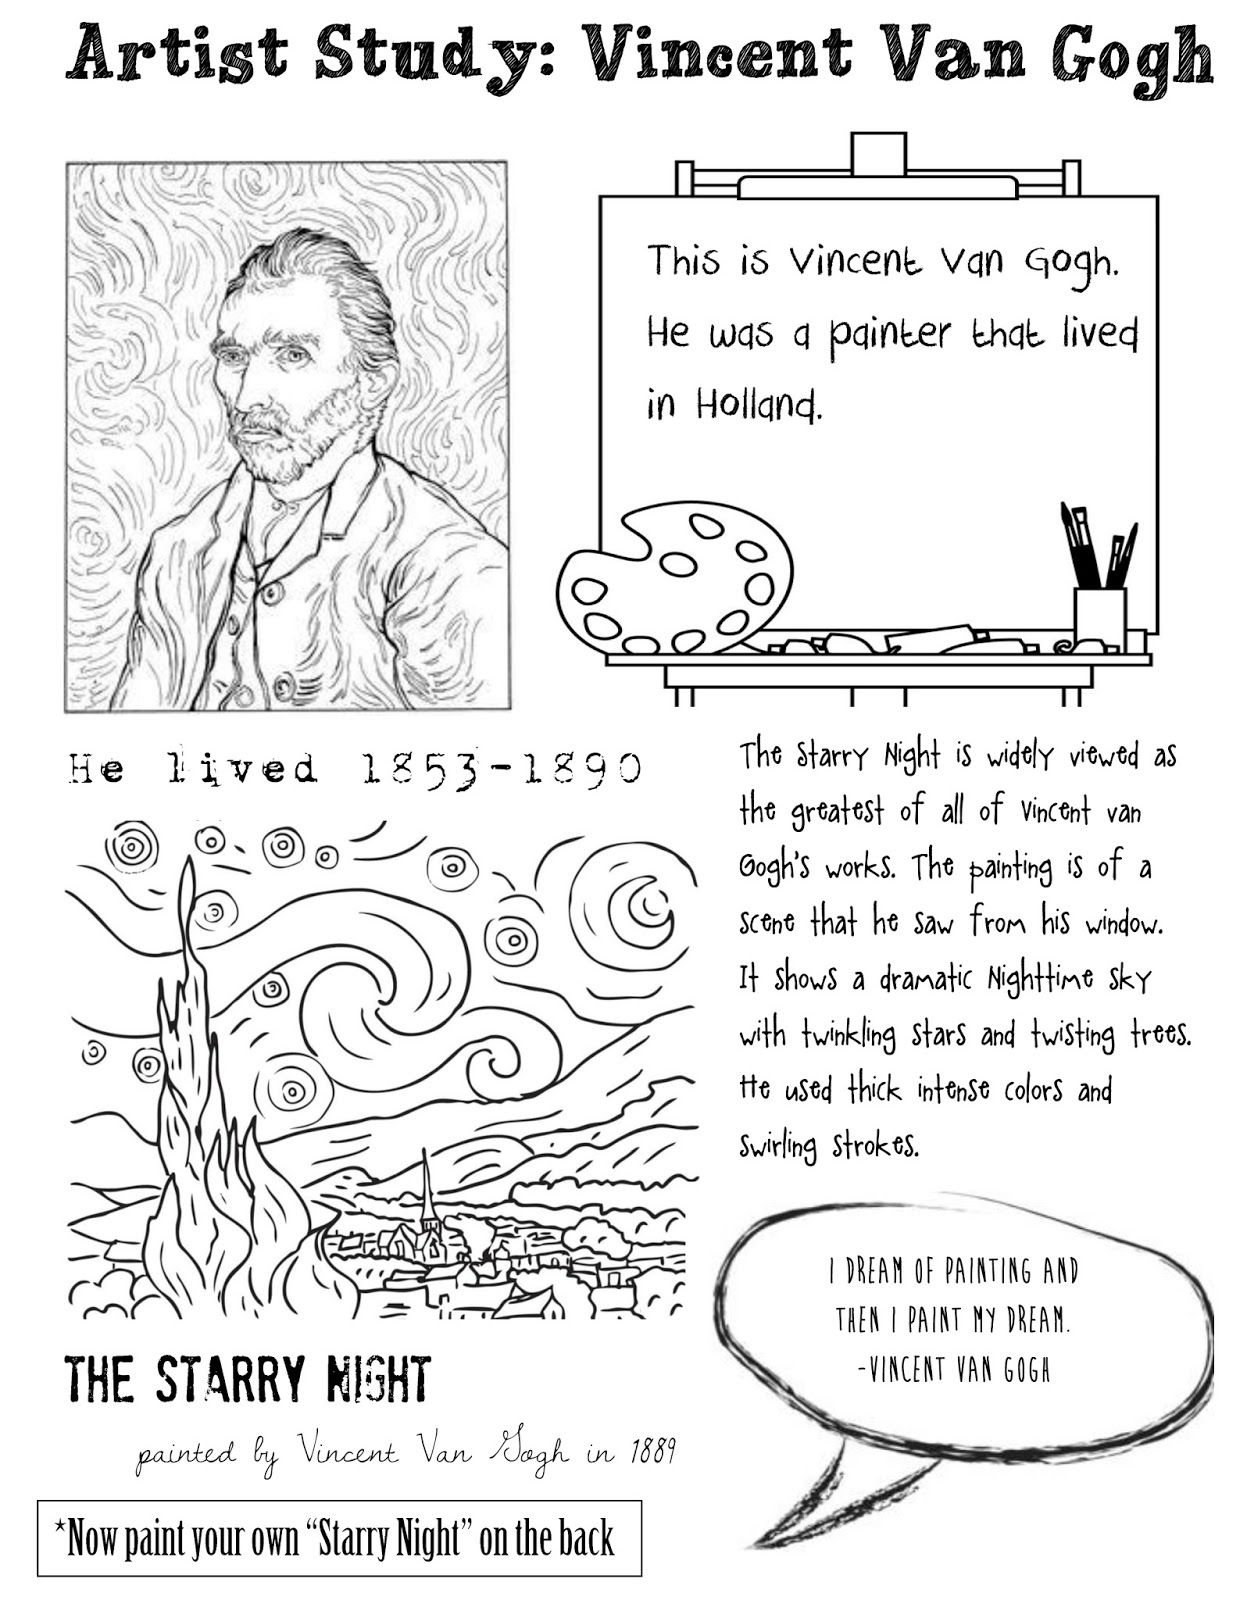 Inspiration Organization Artist Study Vincent Van Gogh